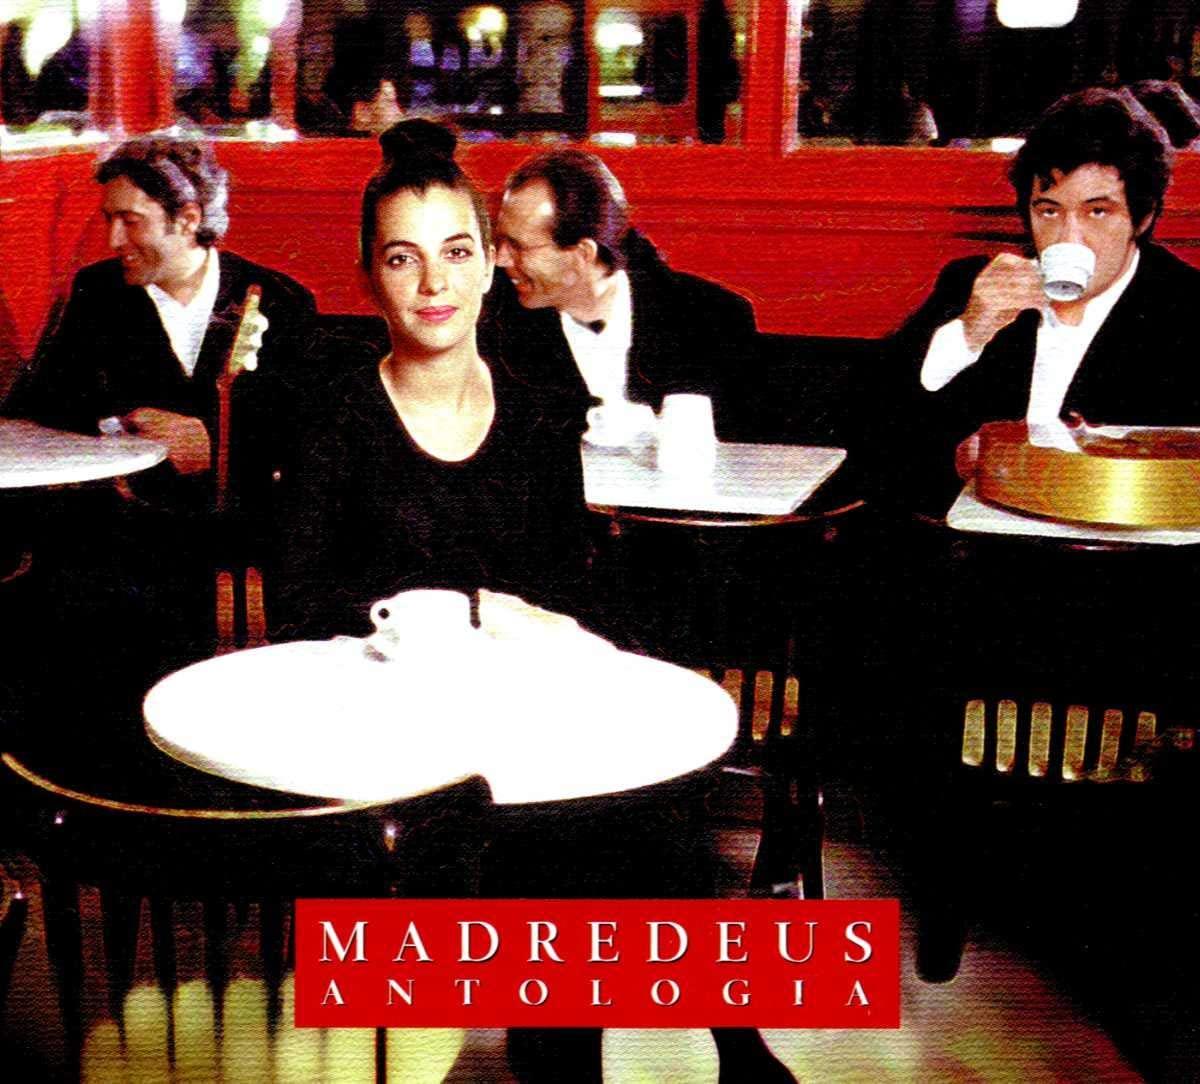 Madredeus Antologia  - Cd Nacional   - Billbox Records